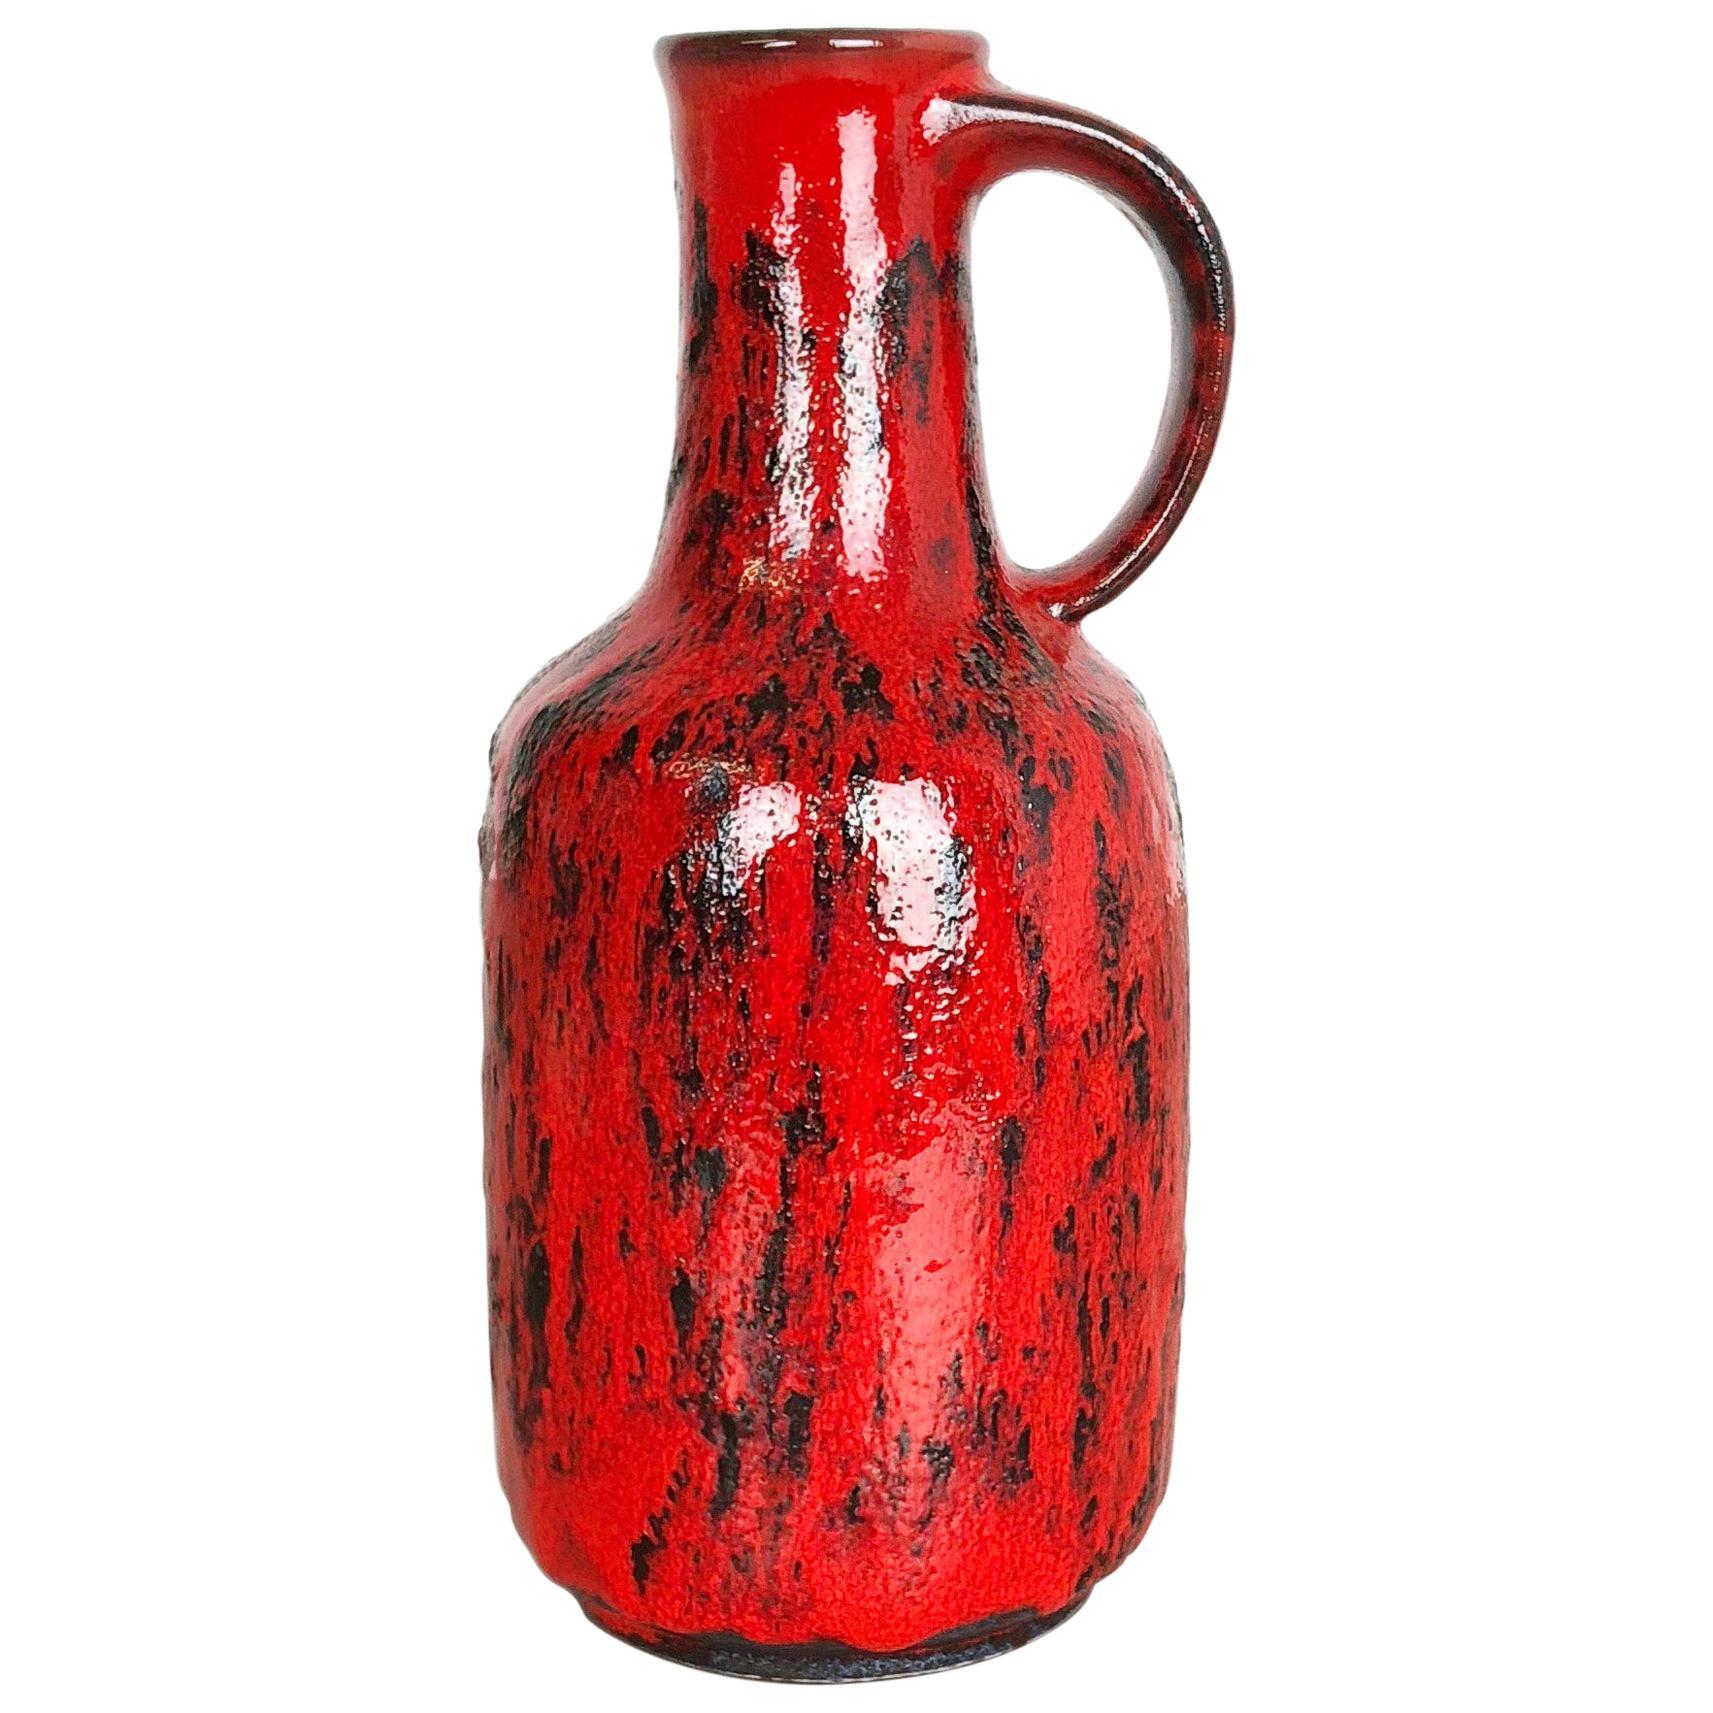 Super Colorful Fat Lava Pottery Vase by Gräflich Ortenburg, Germany, 1950s